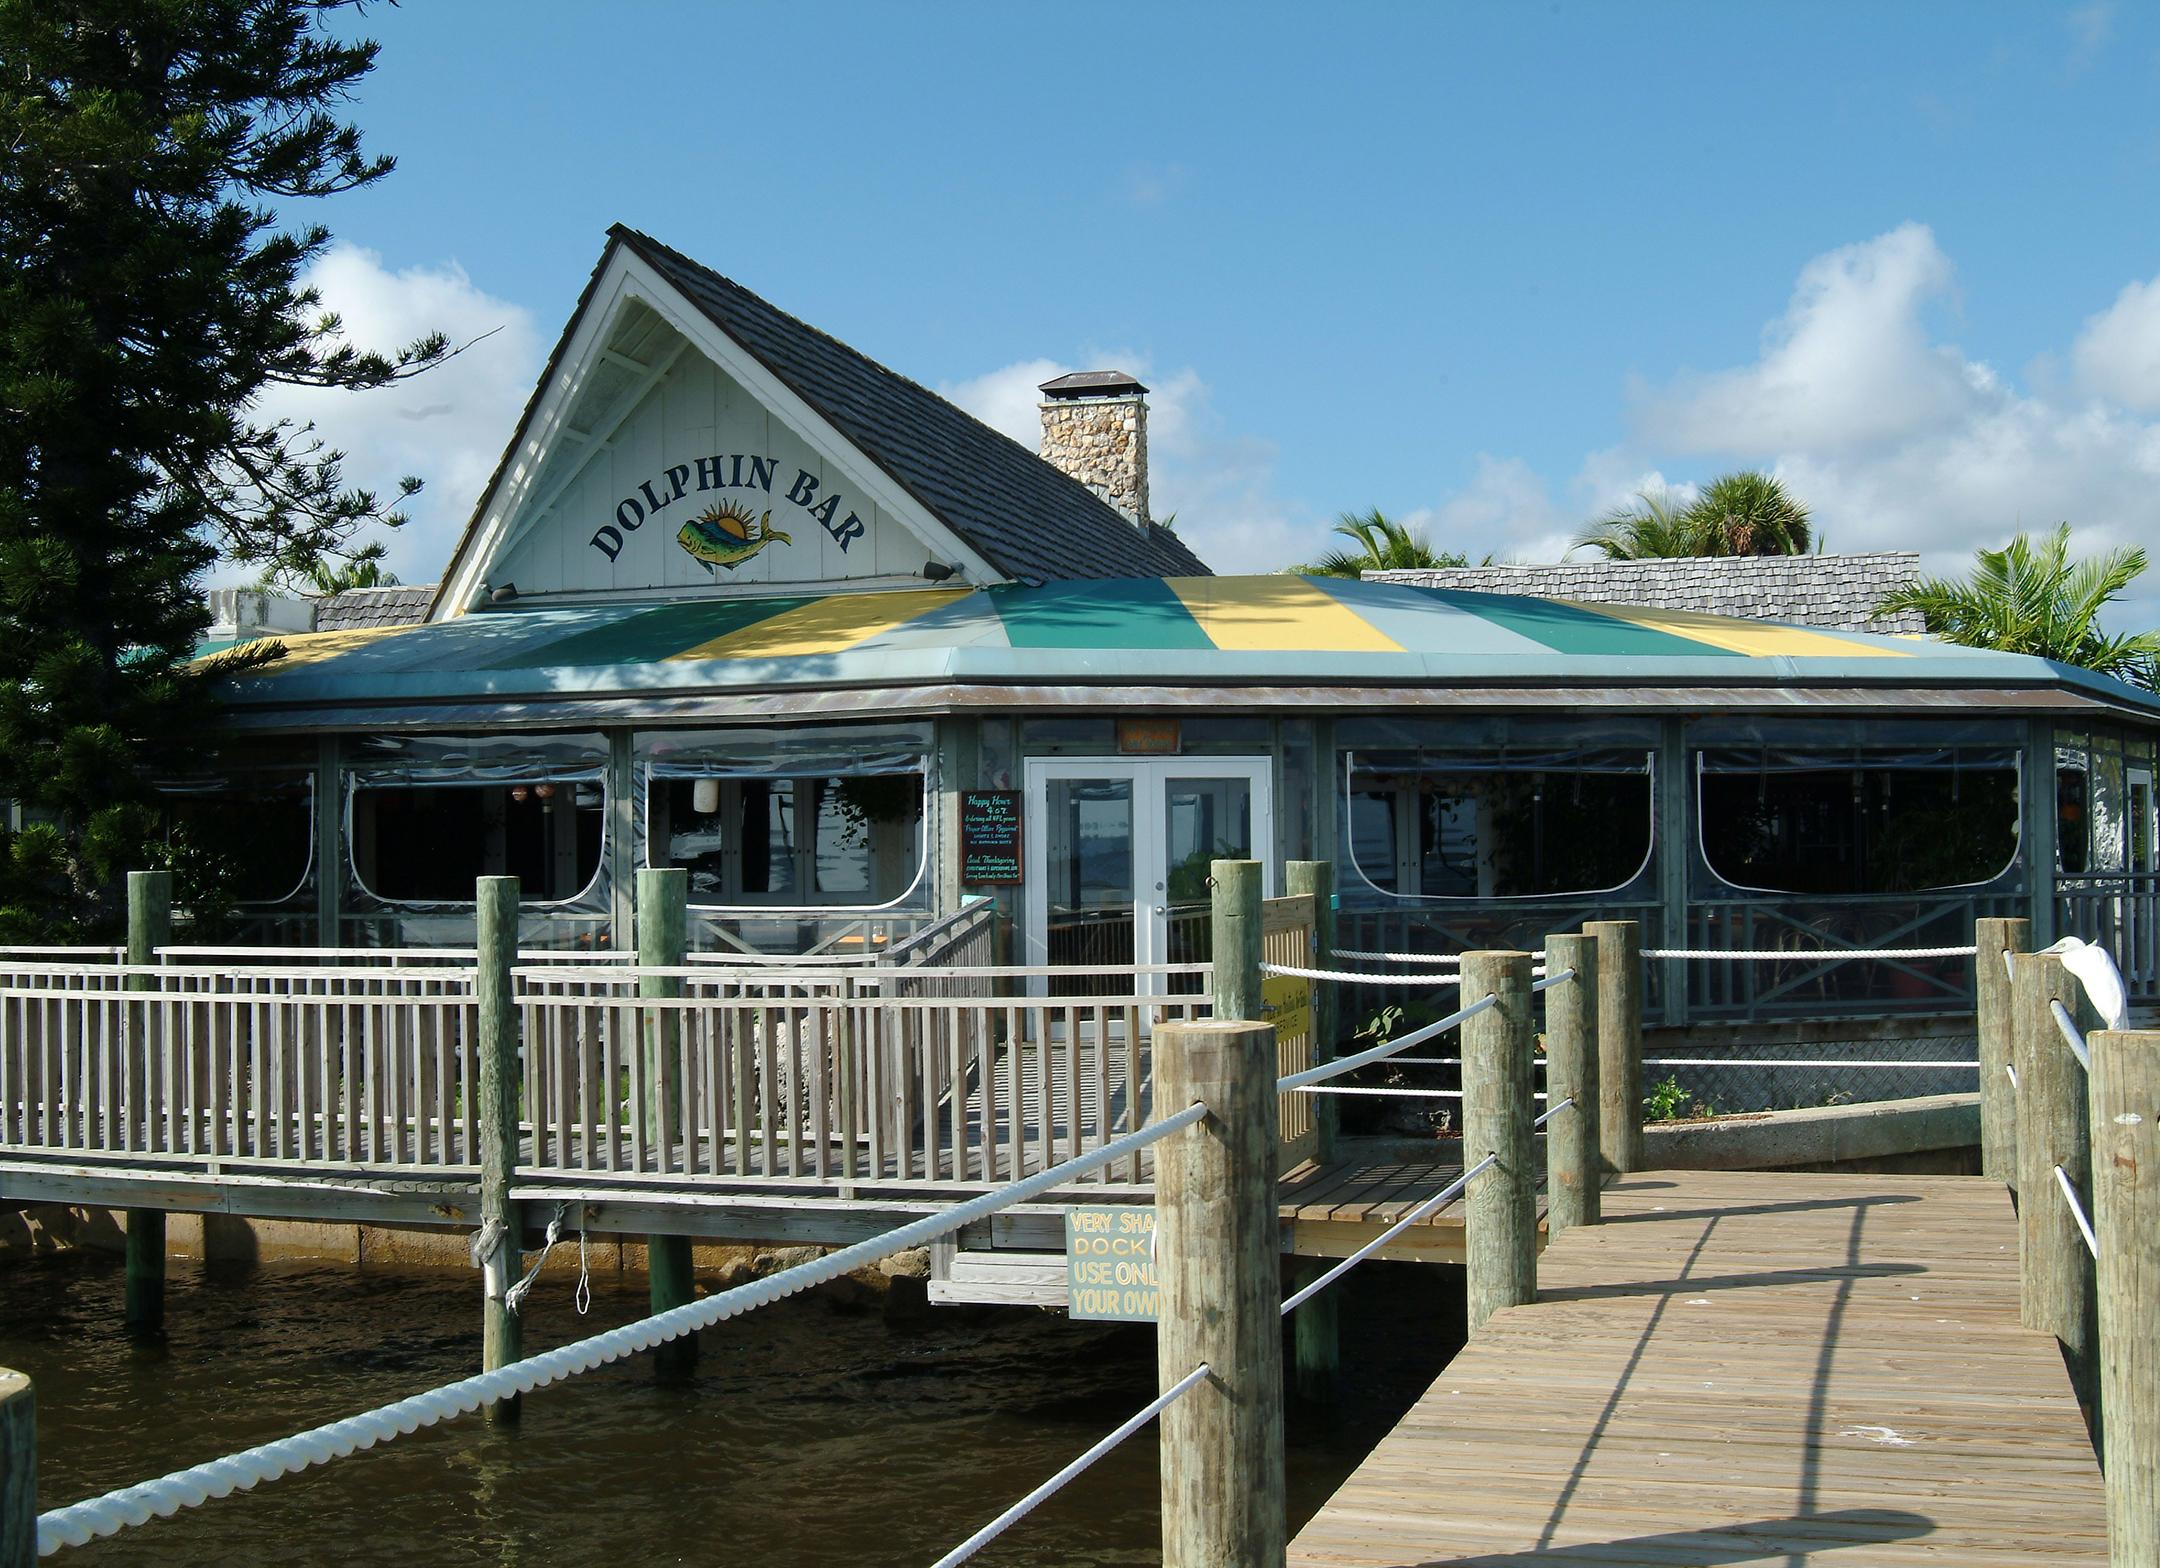 Dolphin Bar & Grill